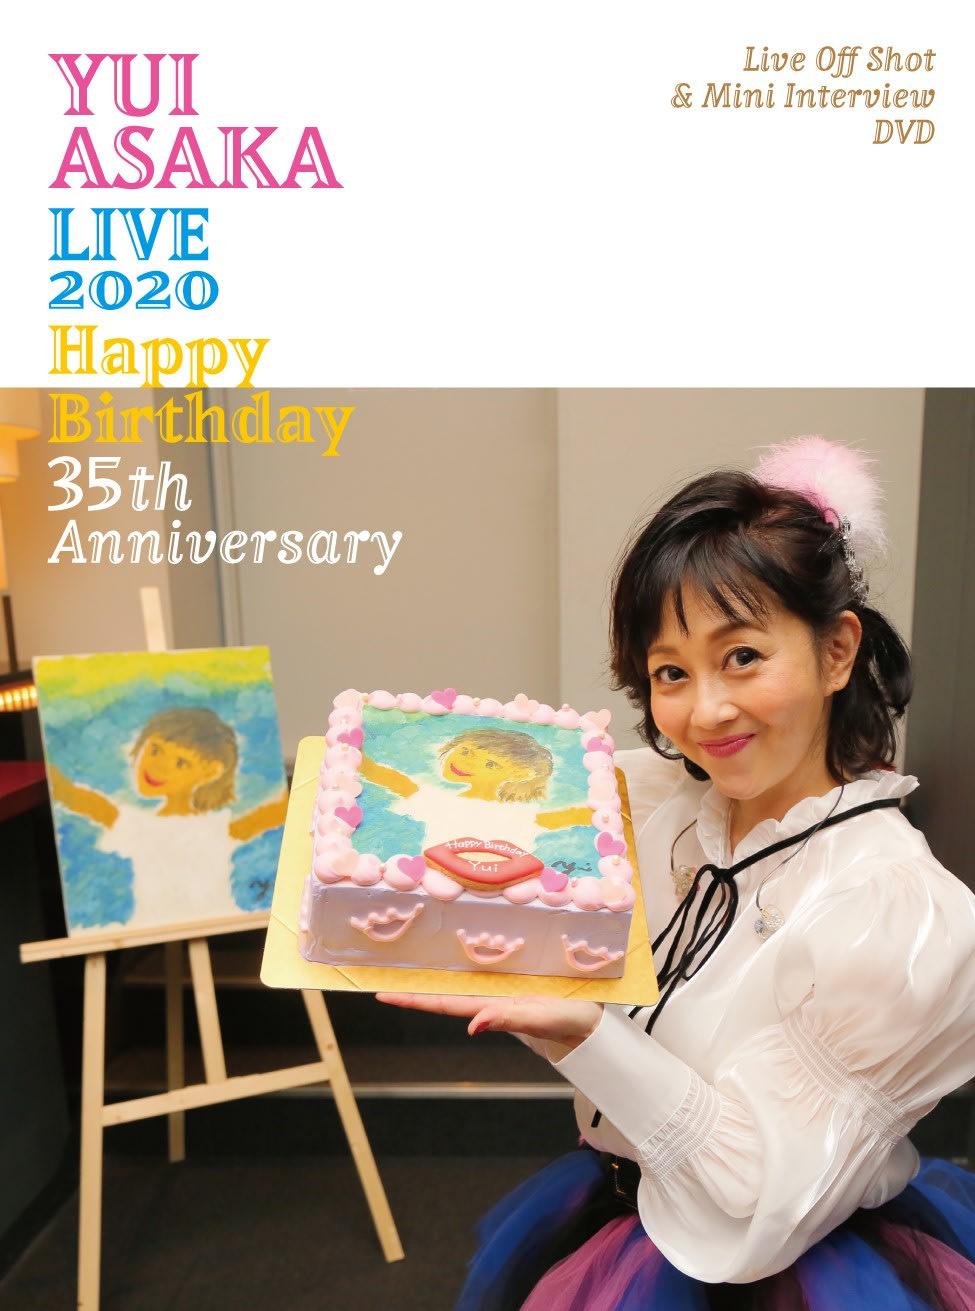 【WIZY限定】YUI ASAKA LIVE 2020 ライヴオフショット&ミニ・インタビューDVDの画像